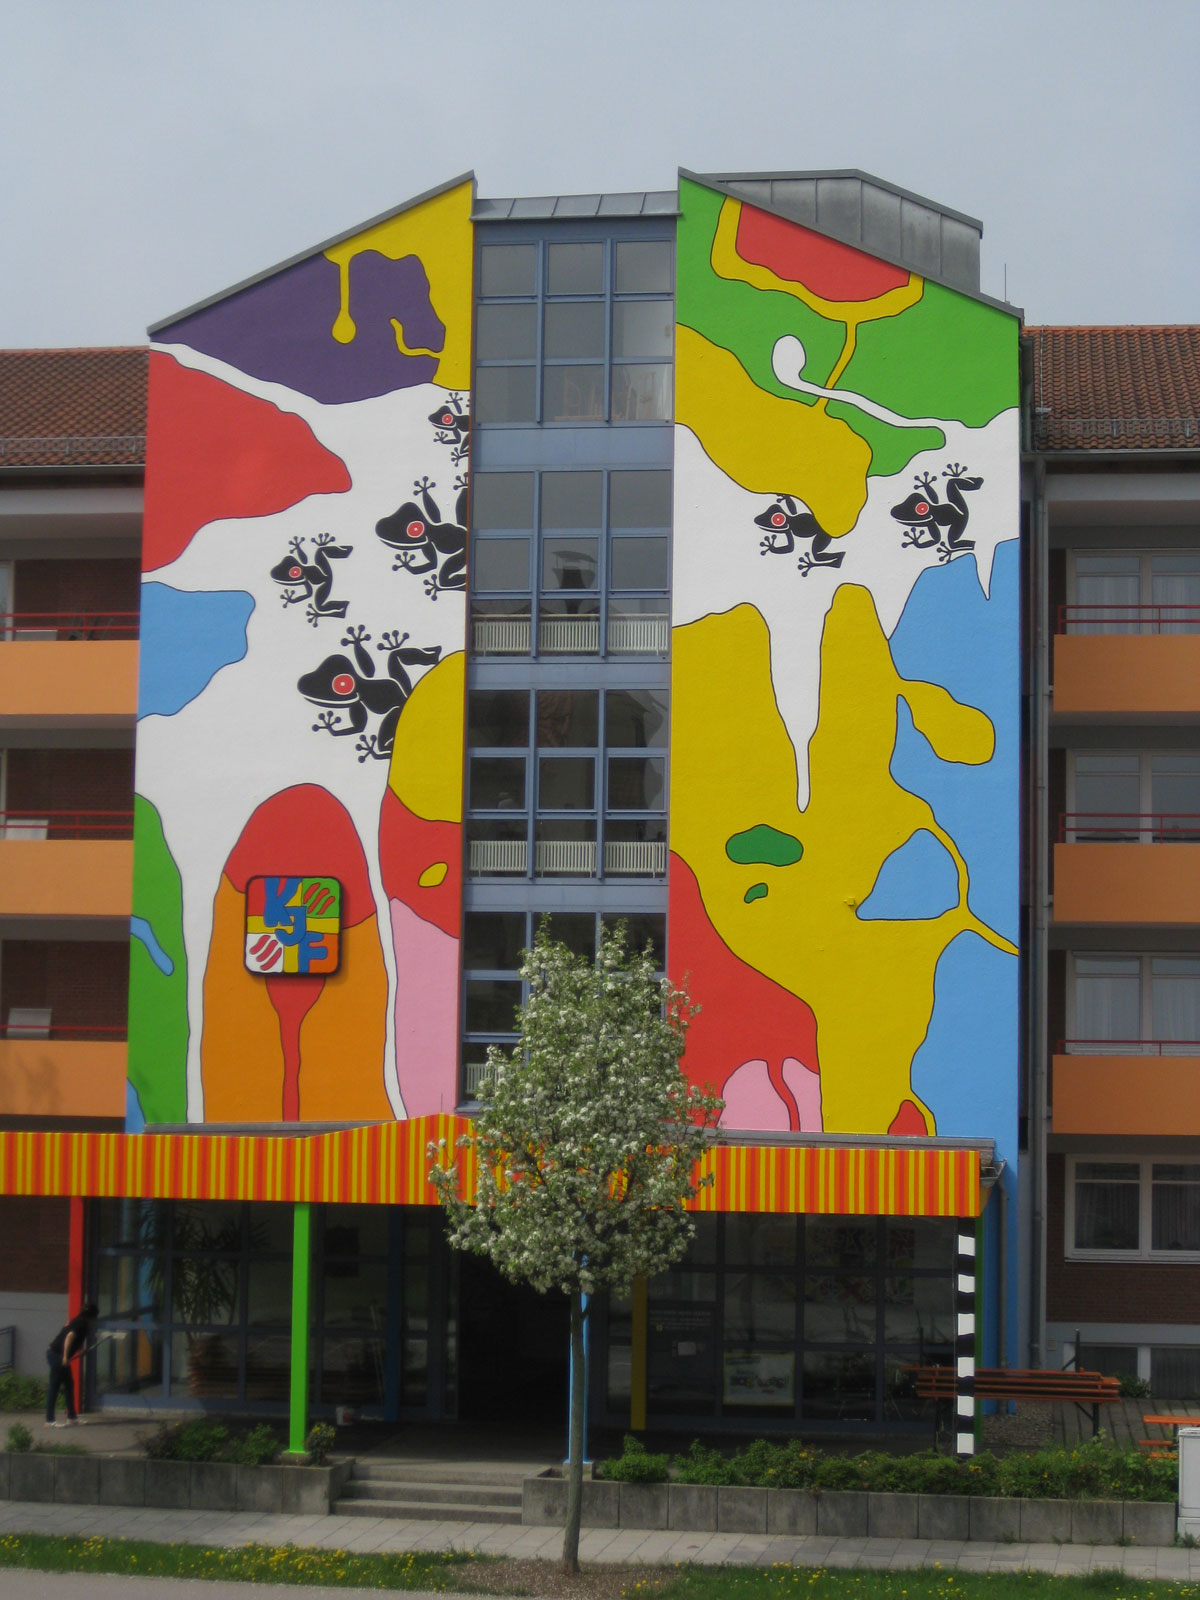 Fassadenkunst Pater Rupert Mayer Zentrum Regensburg